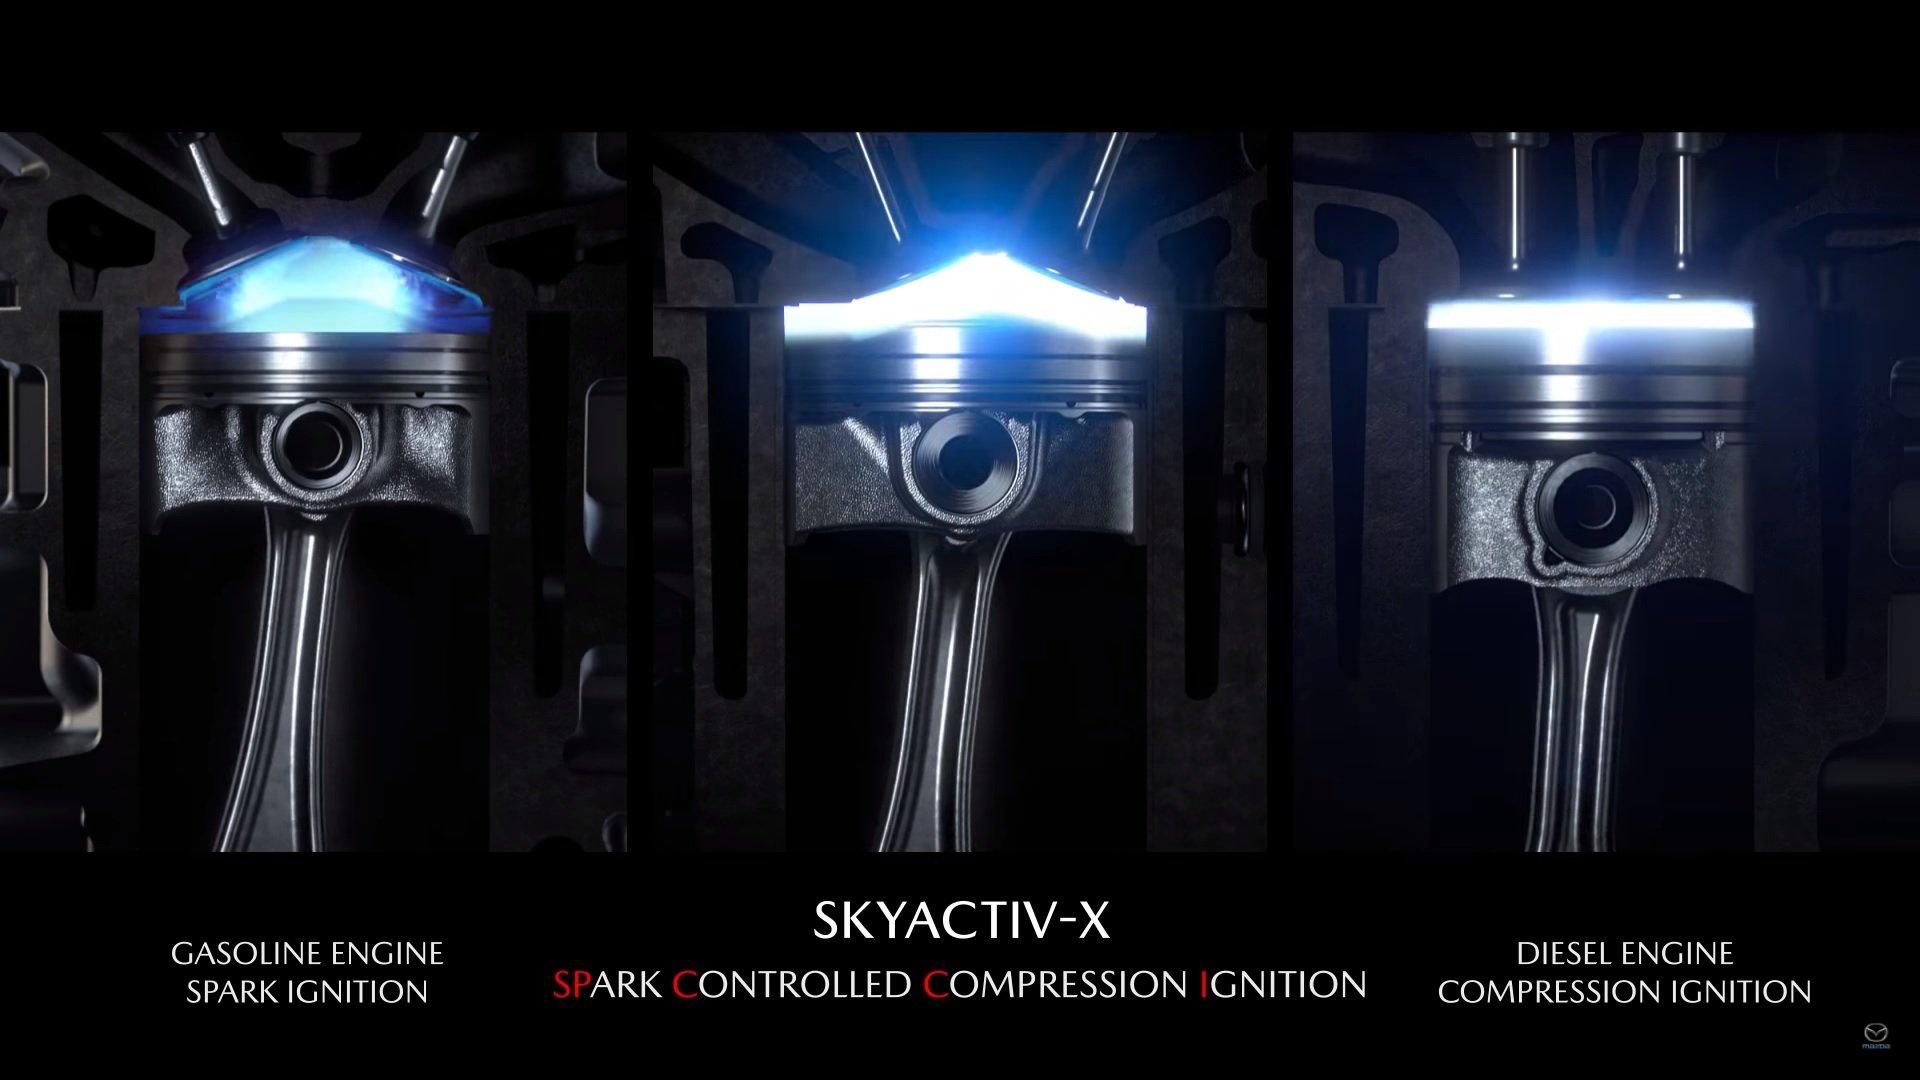 Photo of Σούπερ οικονομικοί οι νέοι SkyActiv-Χ της Mazda [vid]